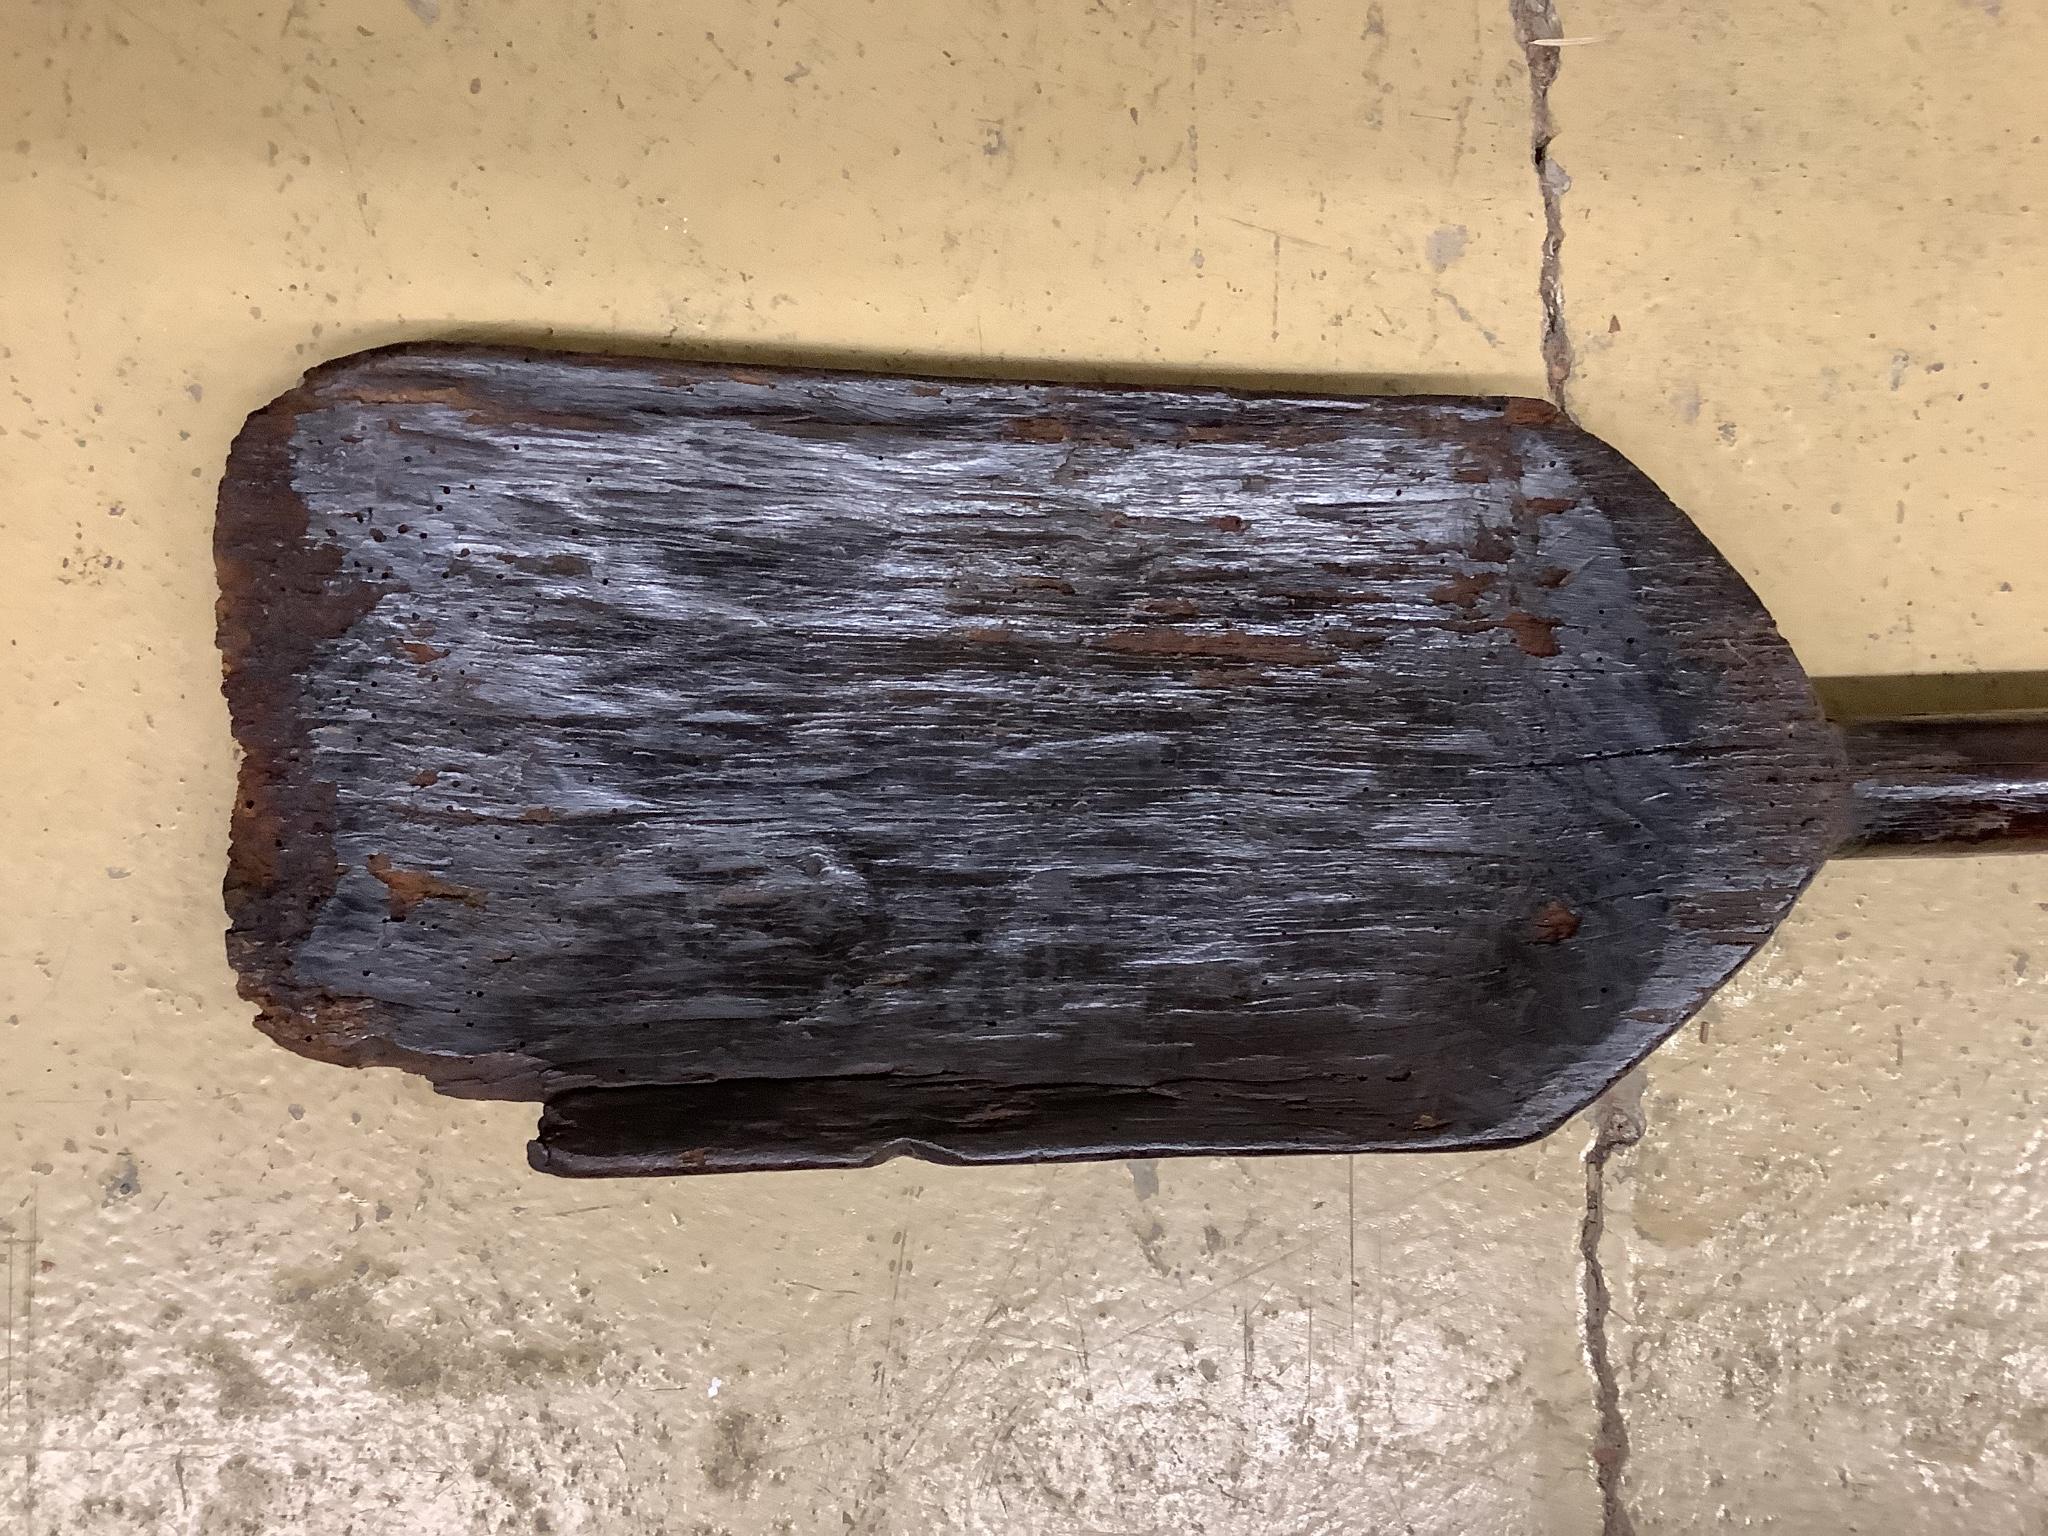 A 19th century malt shovel, length 100cm - Image 2 of 3